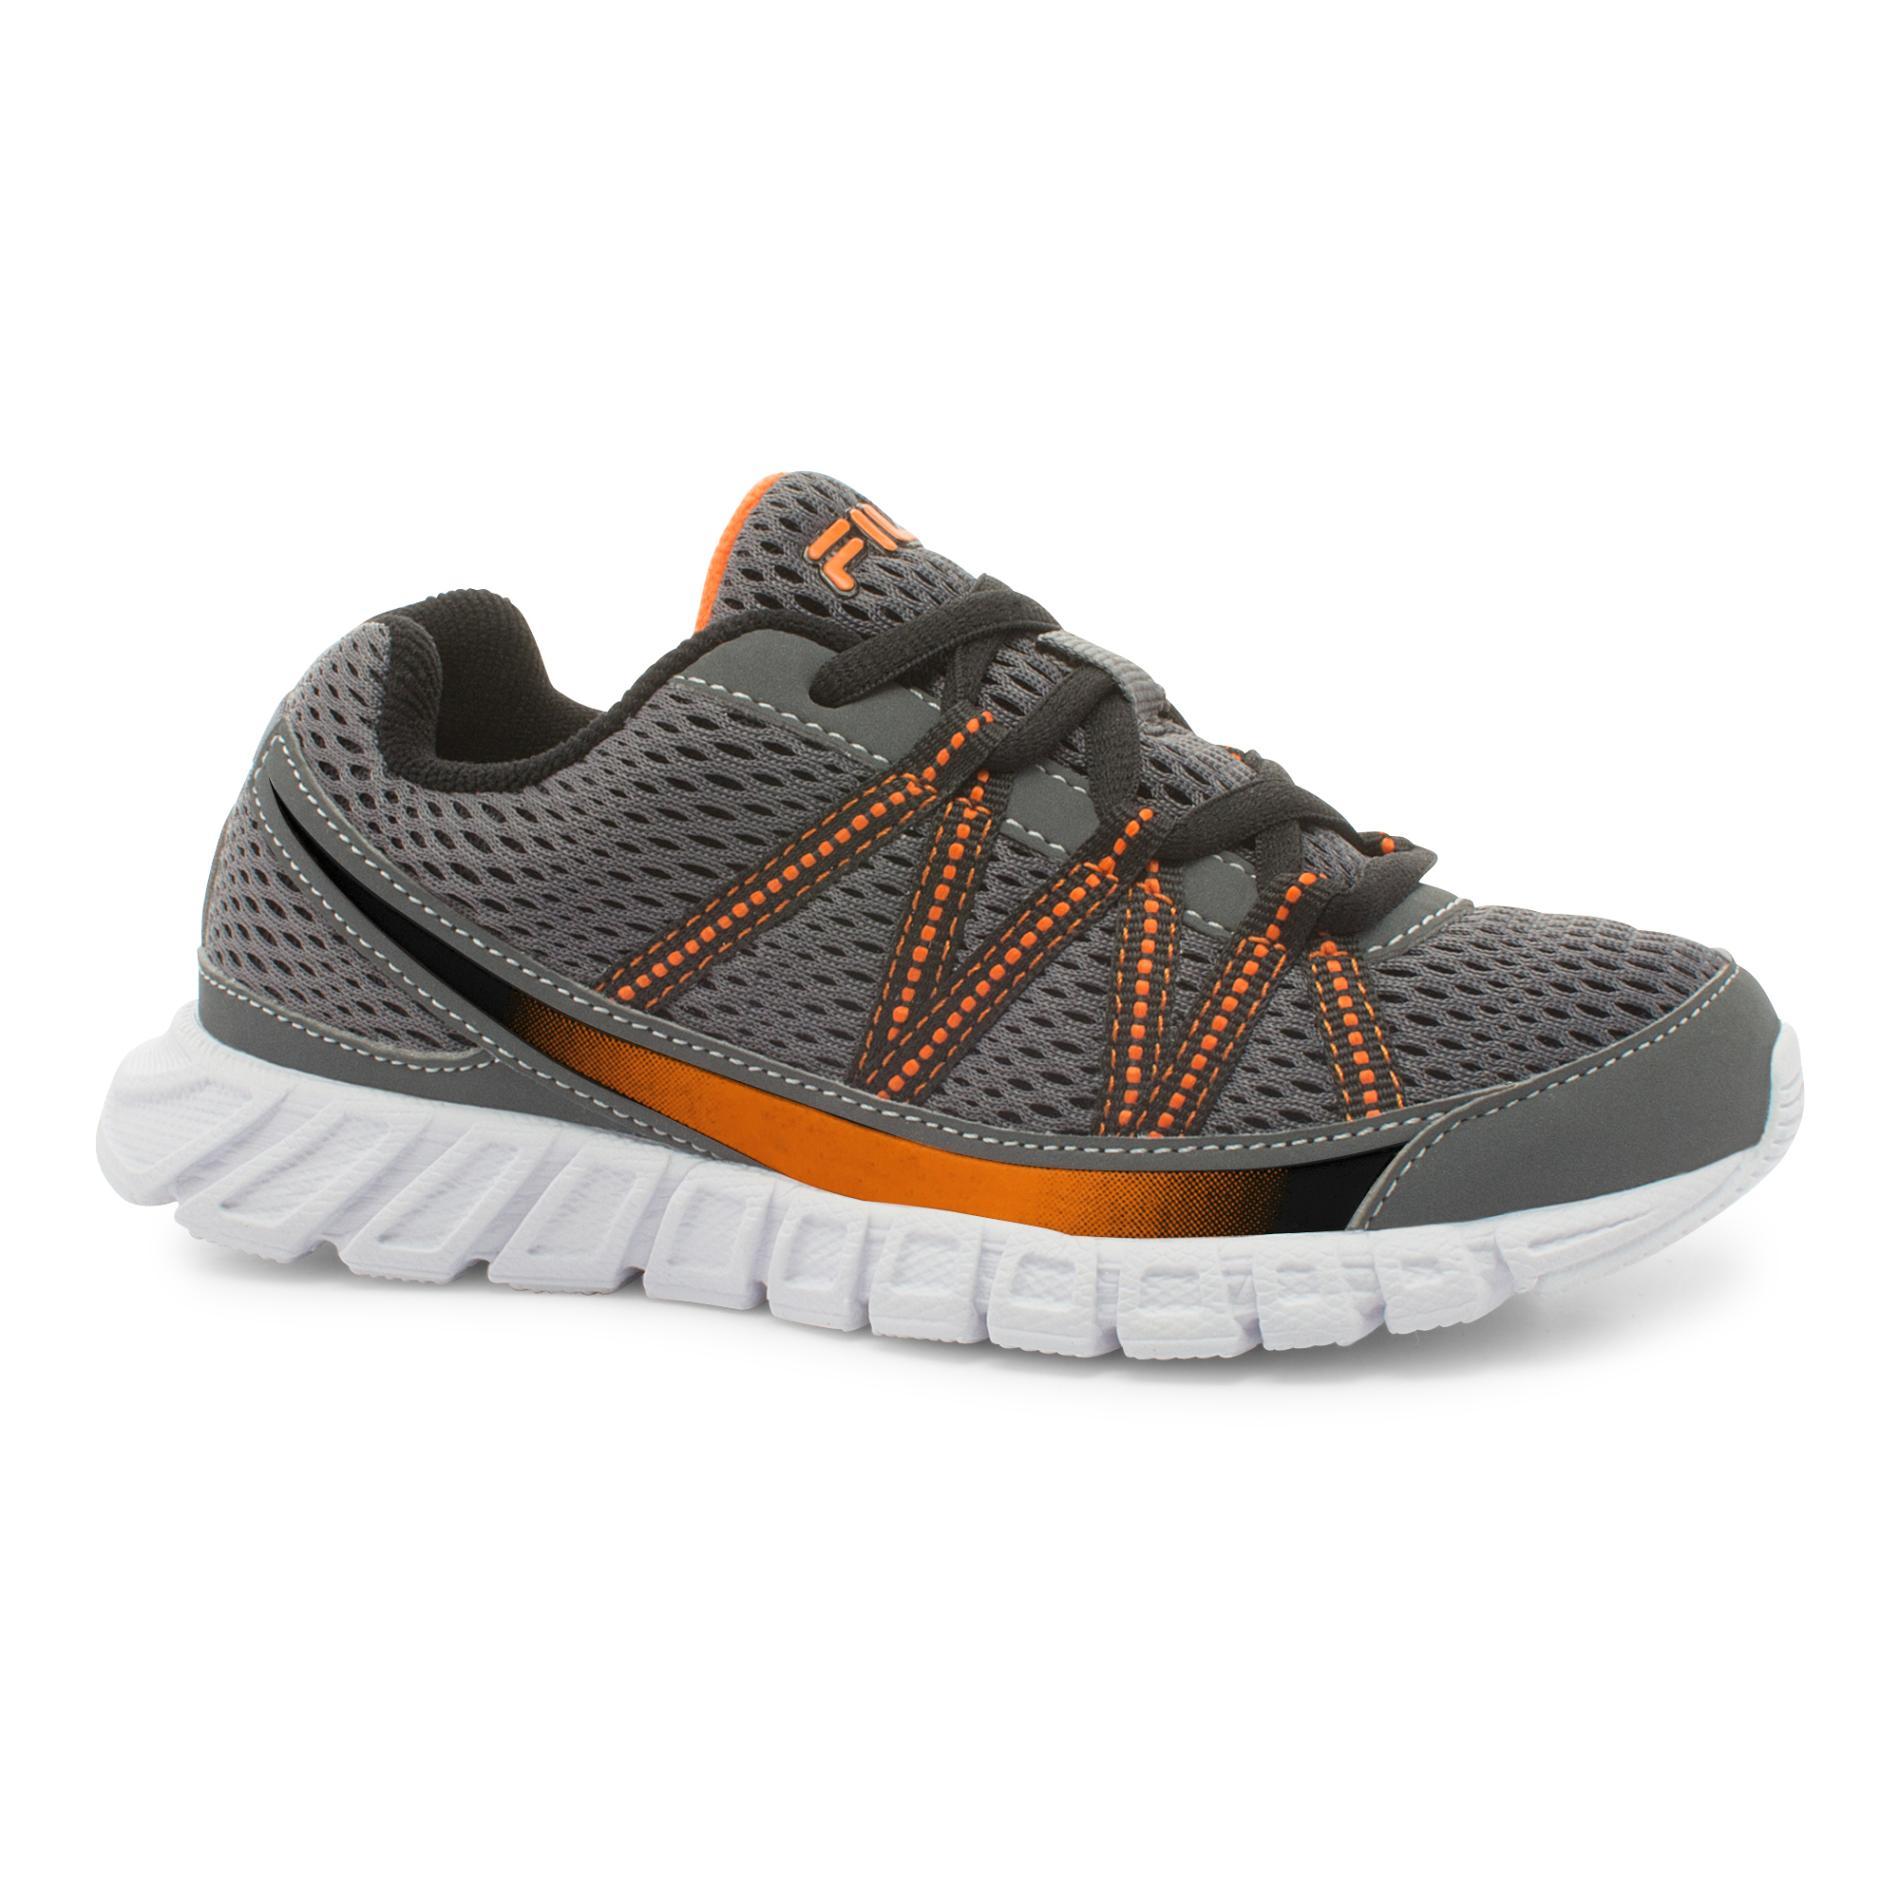 Fila Boy's Flicker Gray/Orange Running Shoe PartNumber: 036VA90169812P MfgPartNumber: 3SR21135